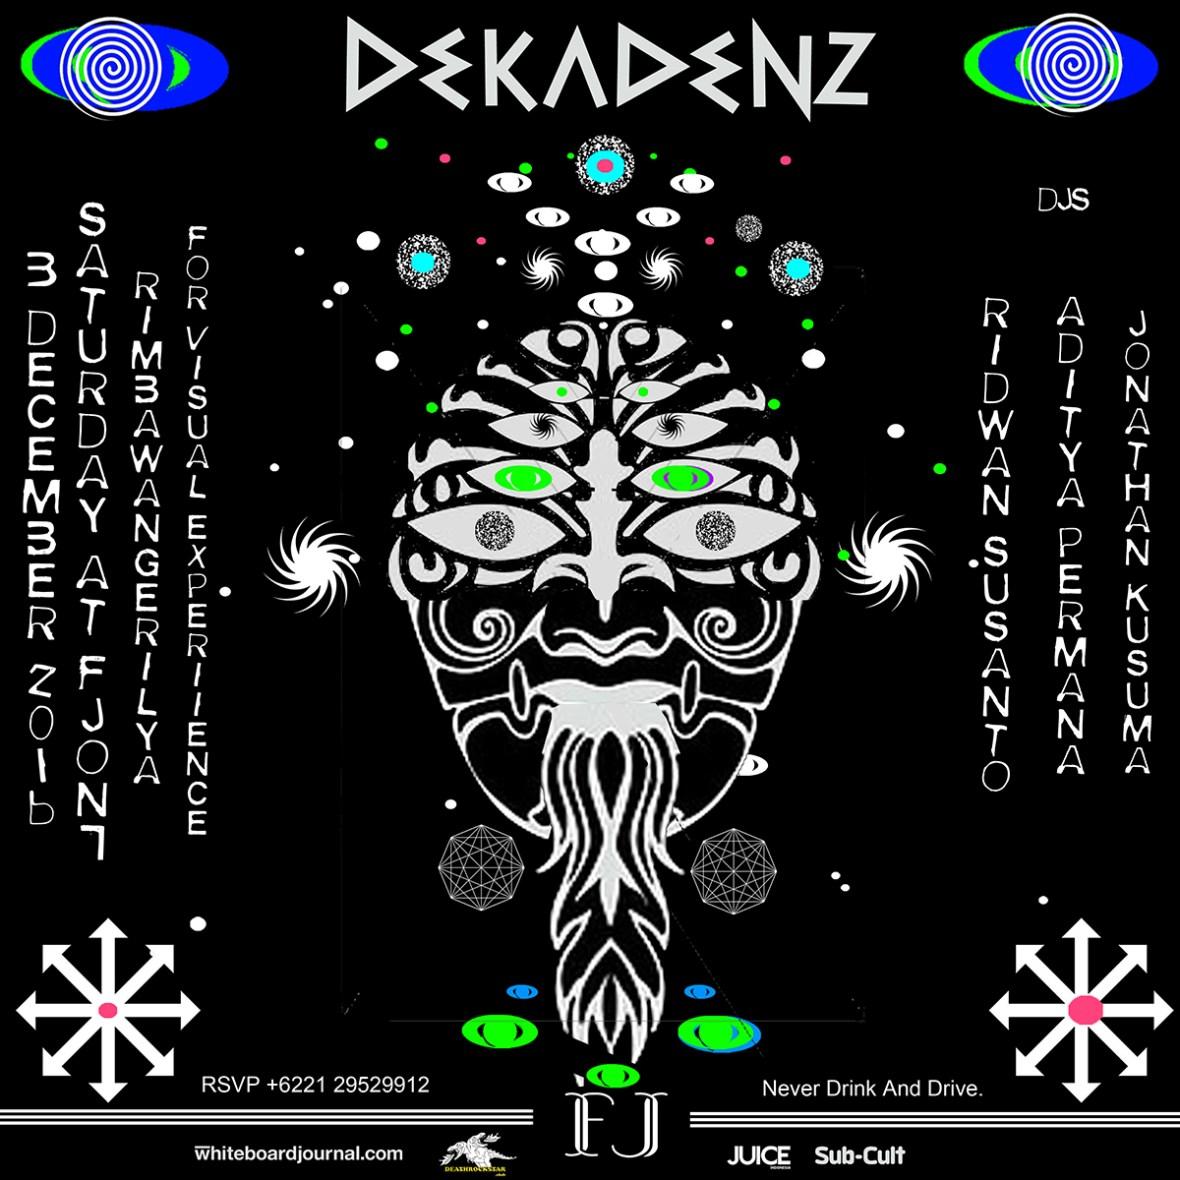 dekadenz-__-3-dec-2016-__-fj-on-7-kemang